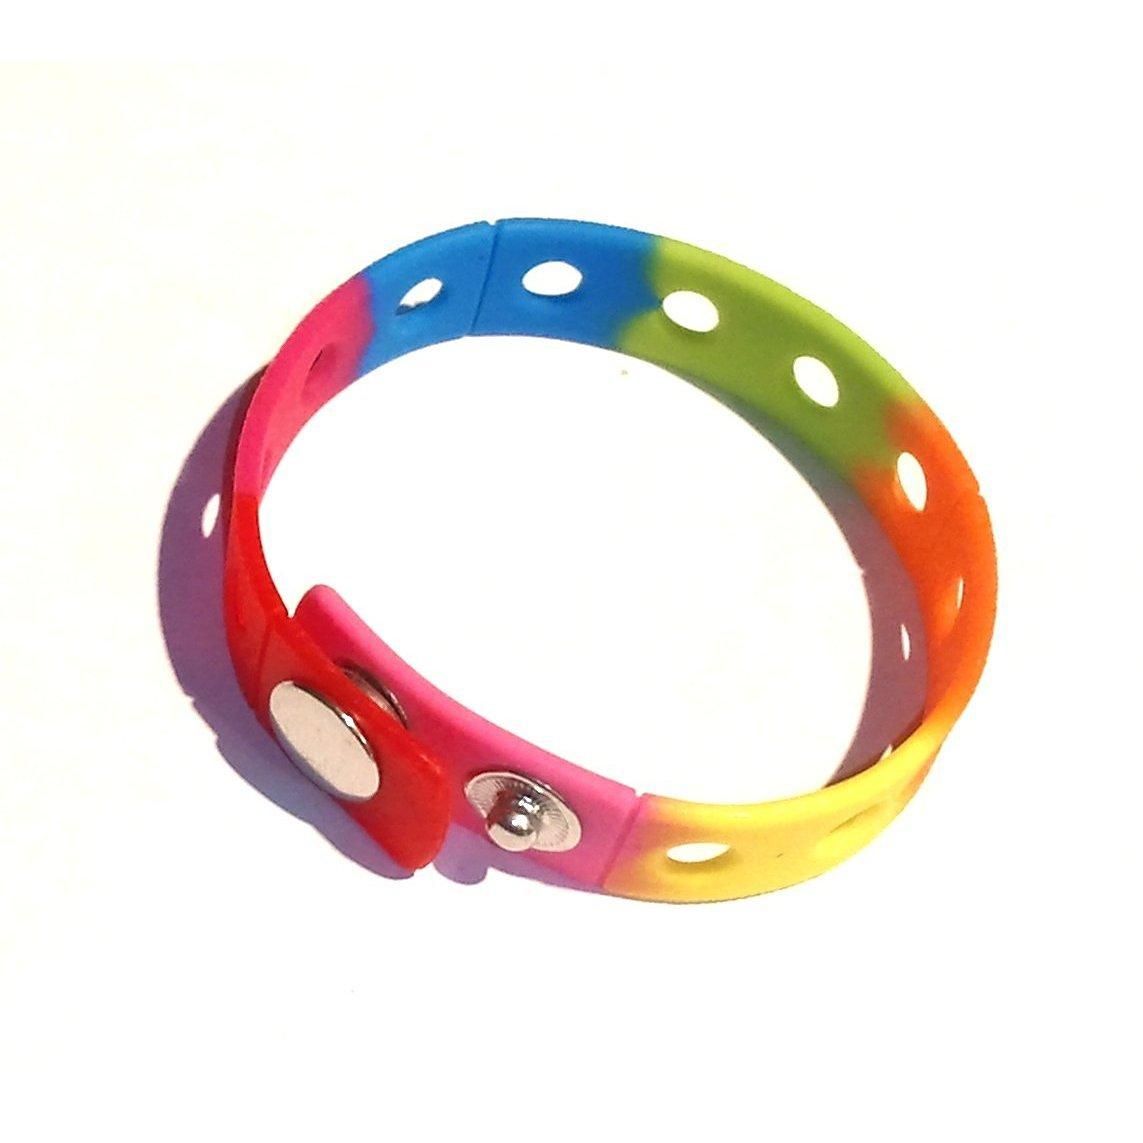 "7"" Rainbow Rubber Bracelet Wristband for Shoe Jibbitz Crocs Charms"